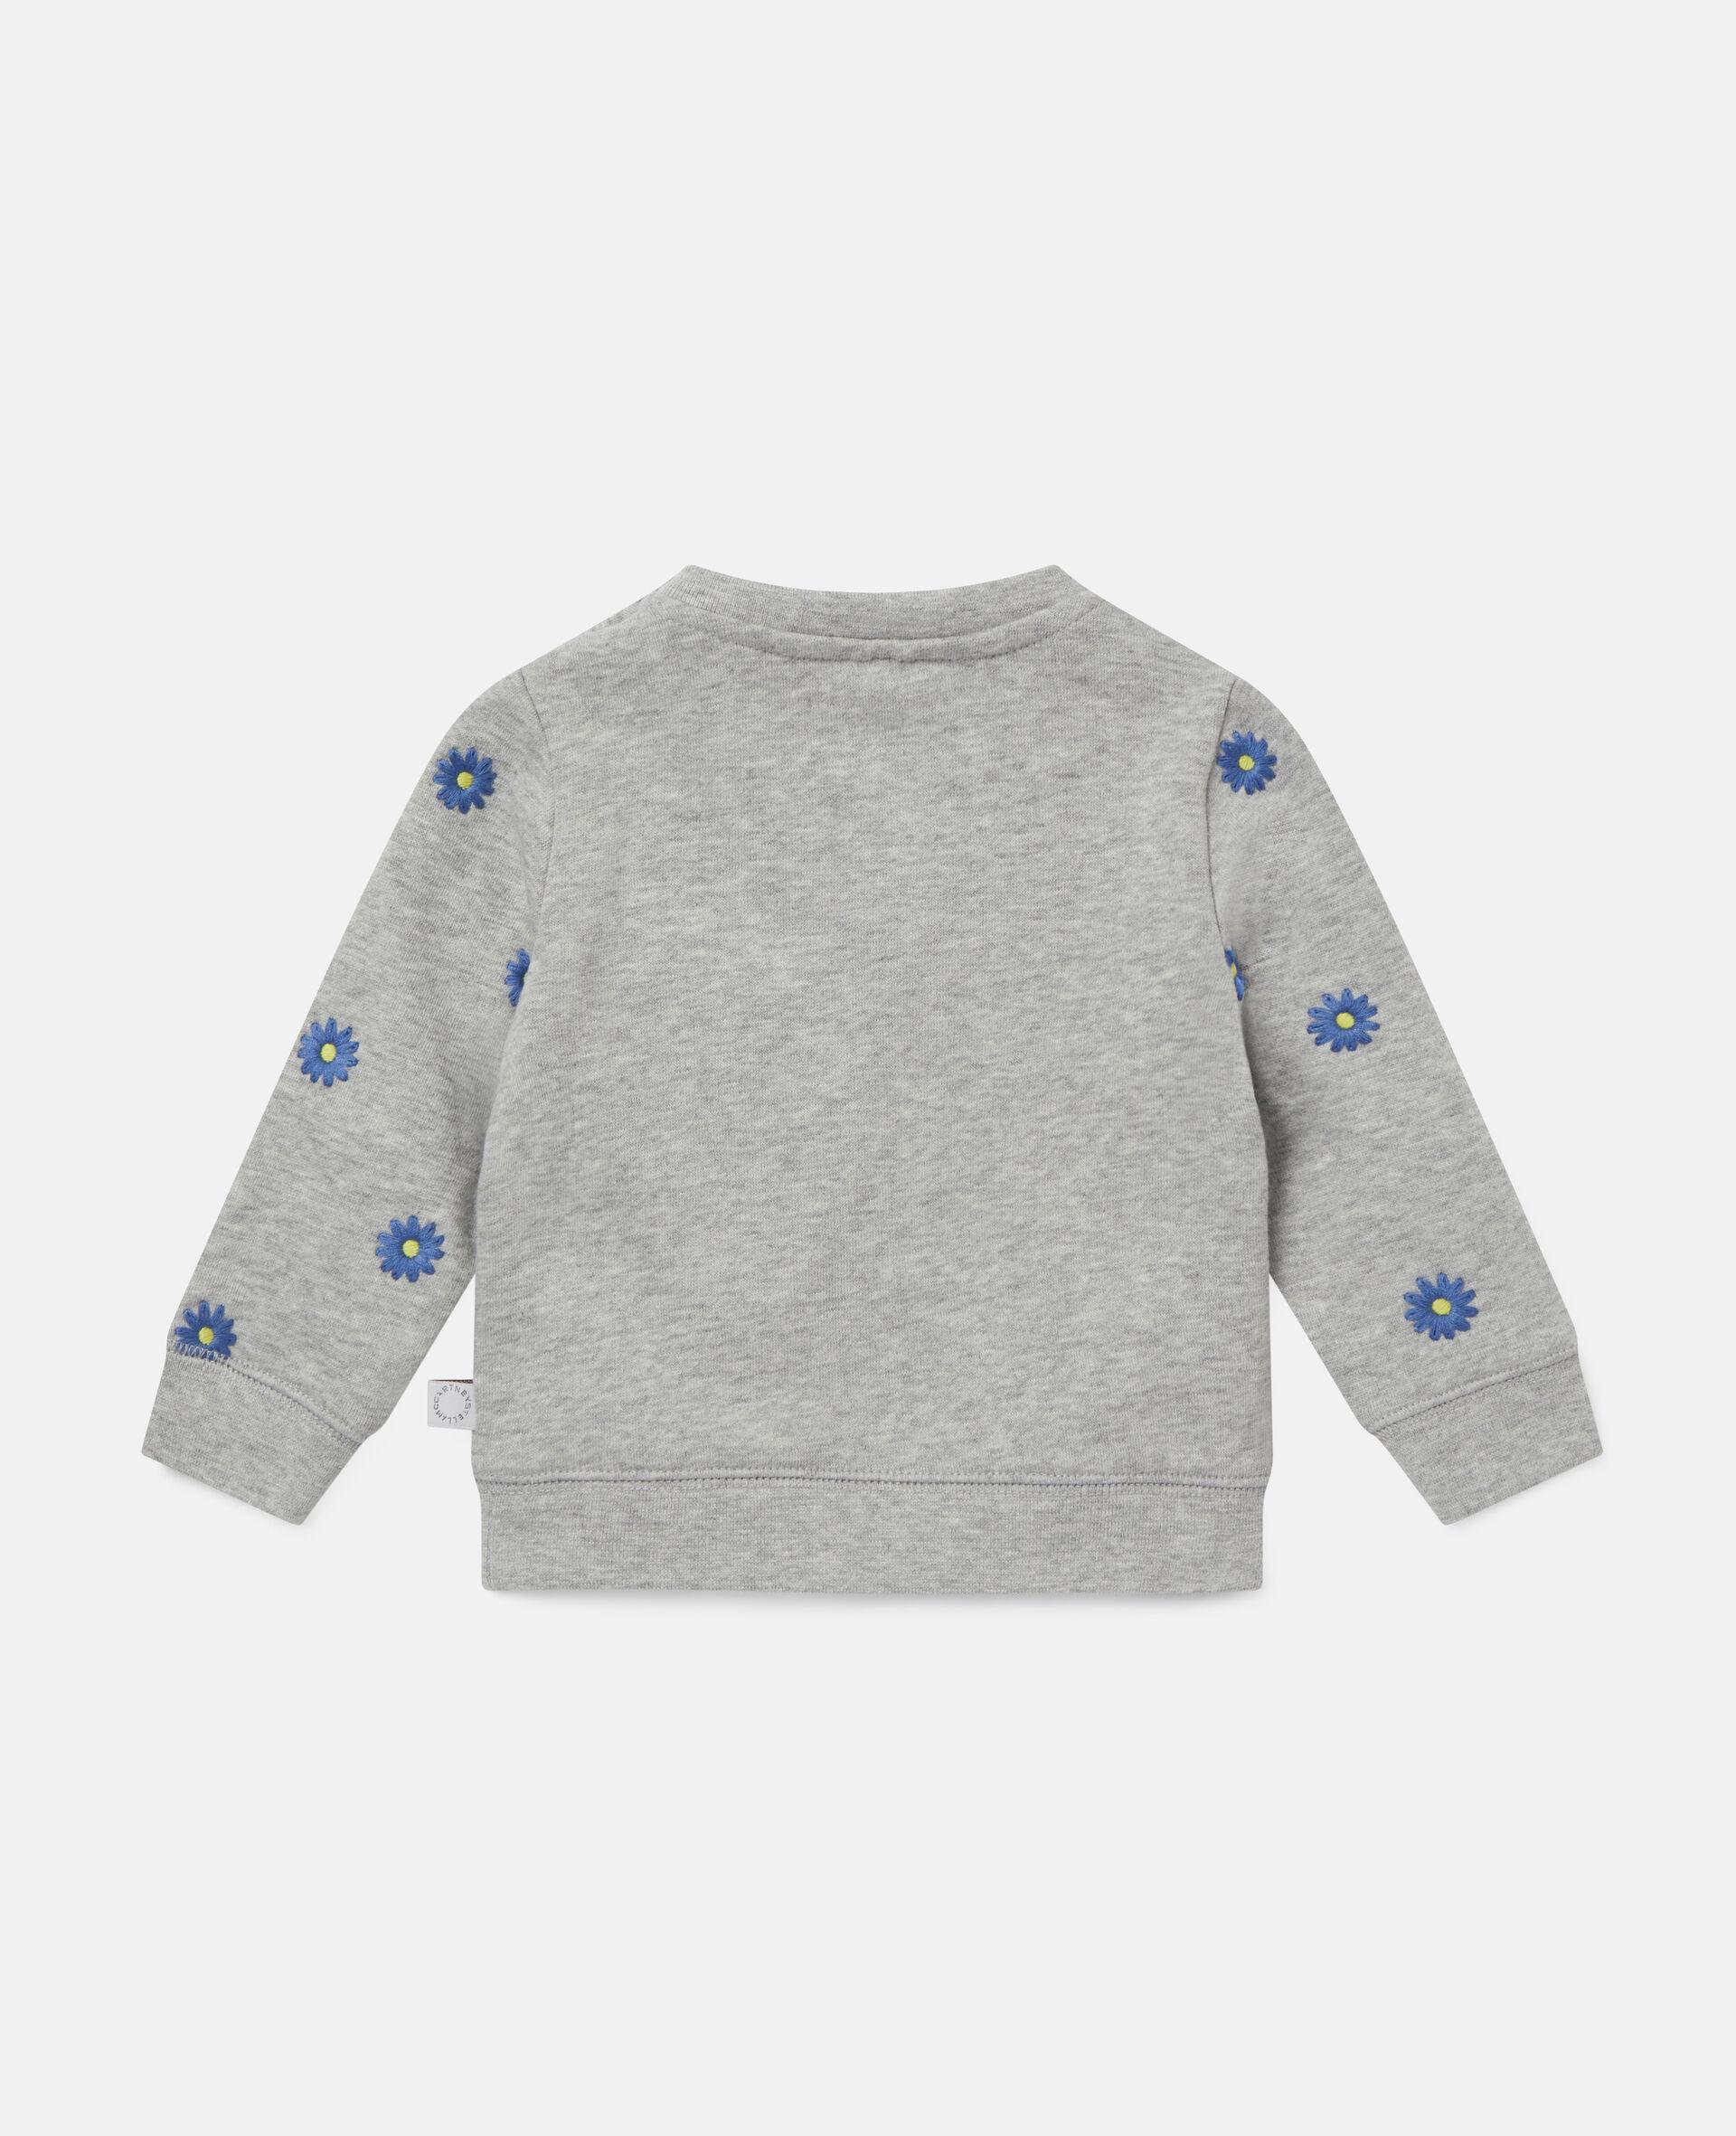 Fleece-Sweatshirt mit Gänseblümchenstickerei -Grau-large image number 3